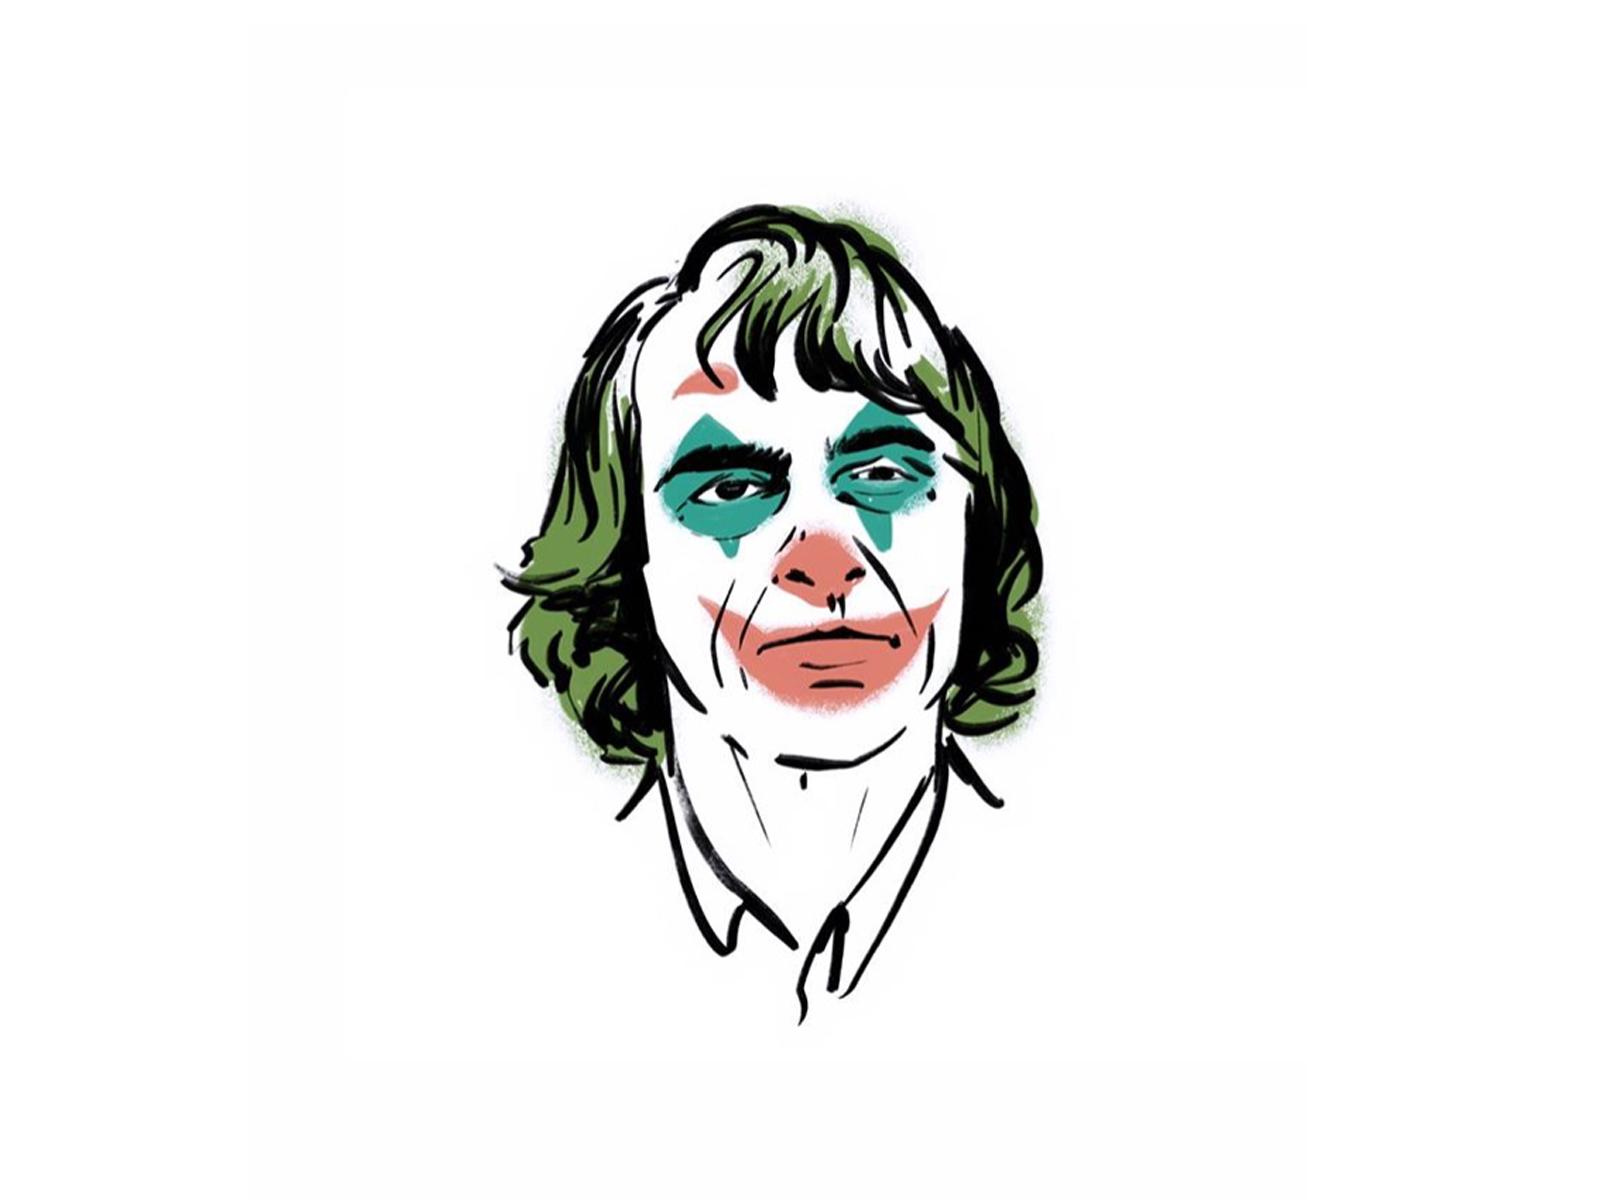 Joaquin Phoenix The Joker By Chad Landenberger On Dribbble